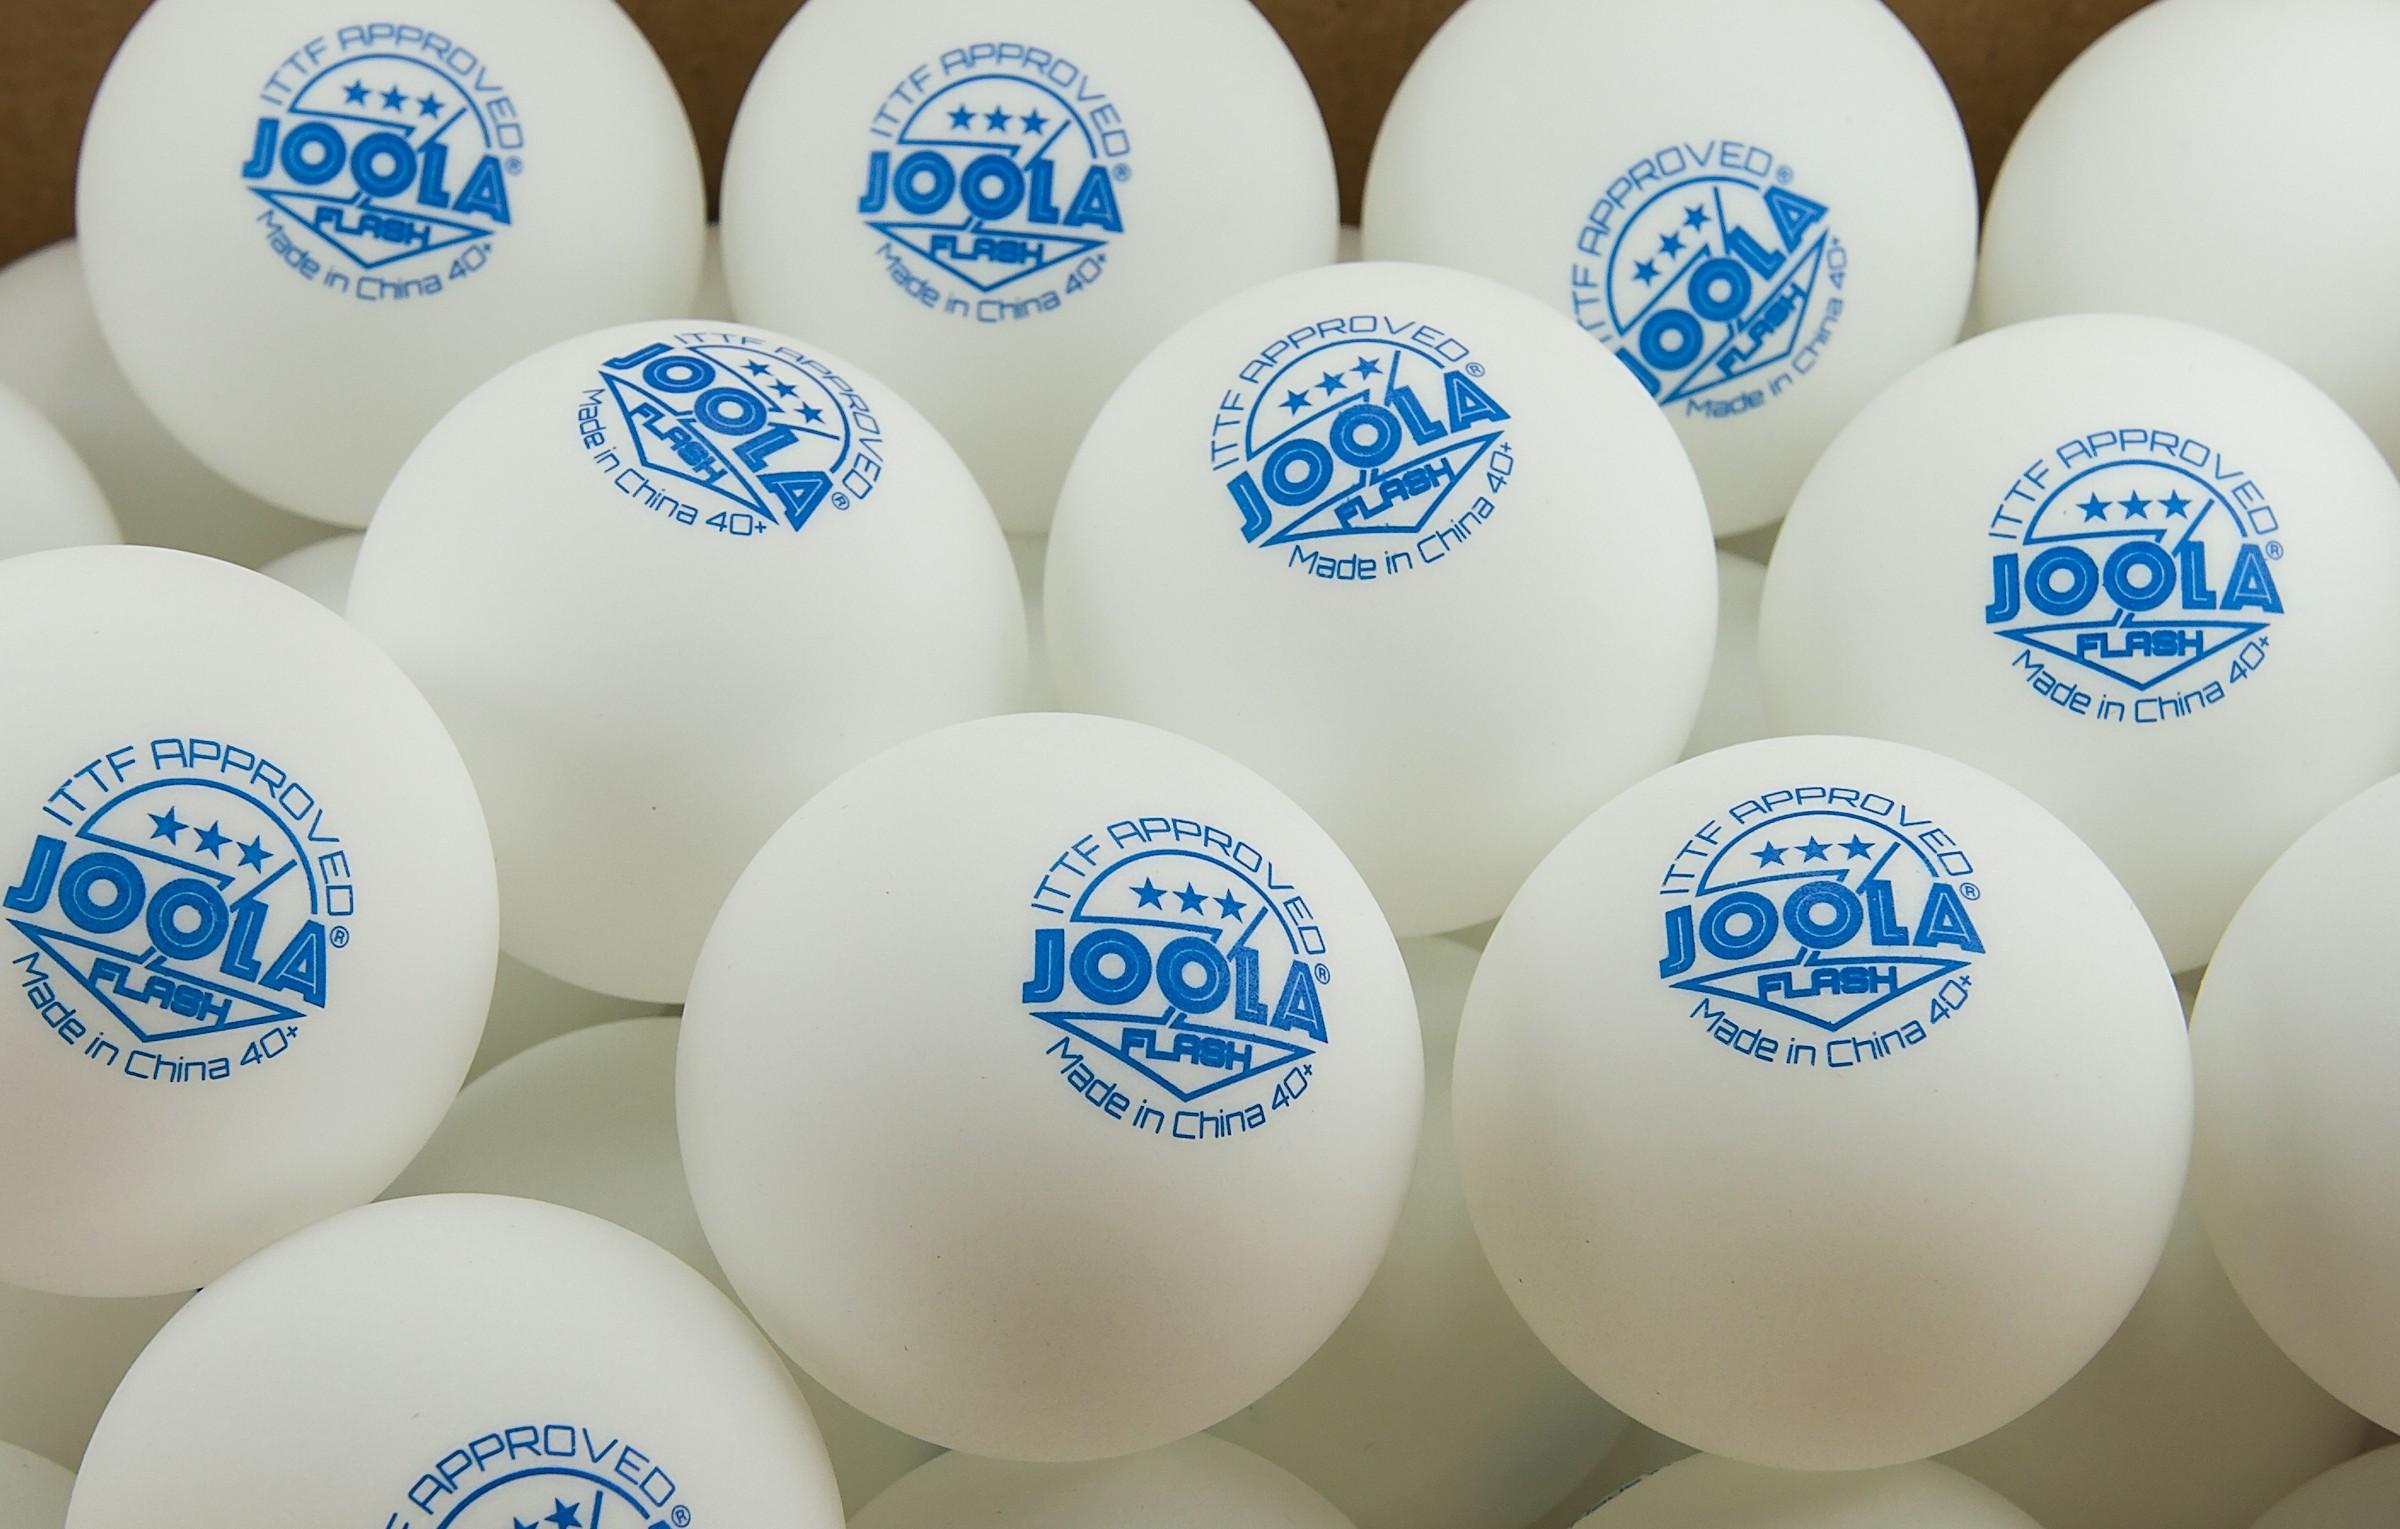 Joola Flash 40+ 3-Star Table Tennis Ball Review